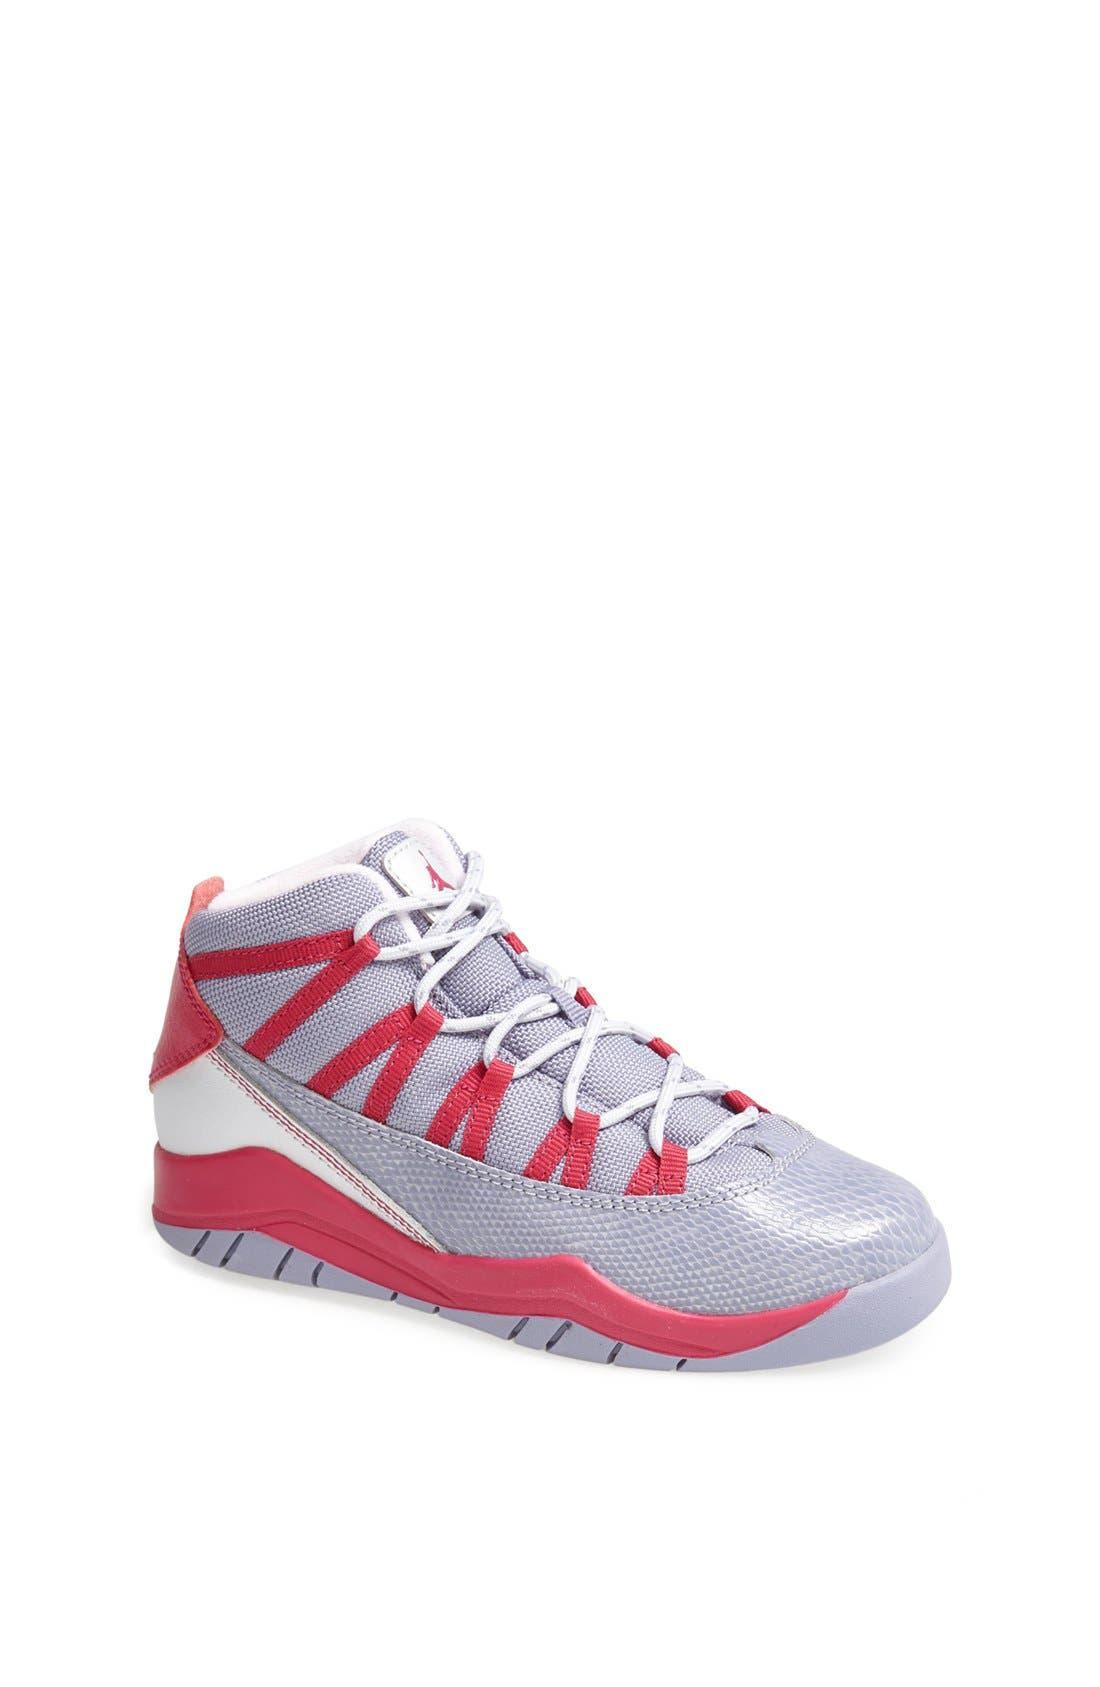 Main Image - Nike 'Jordan Prime Flight' Basketball Shoe (Toddler & Little Kid)